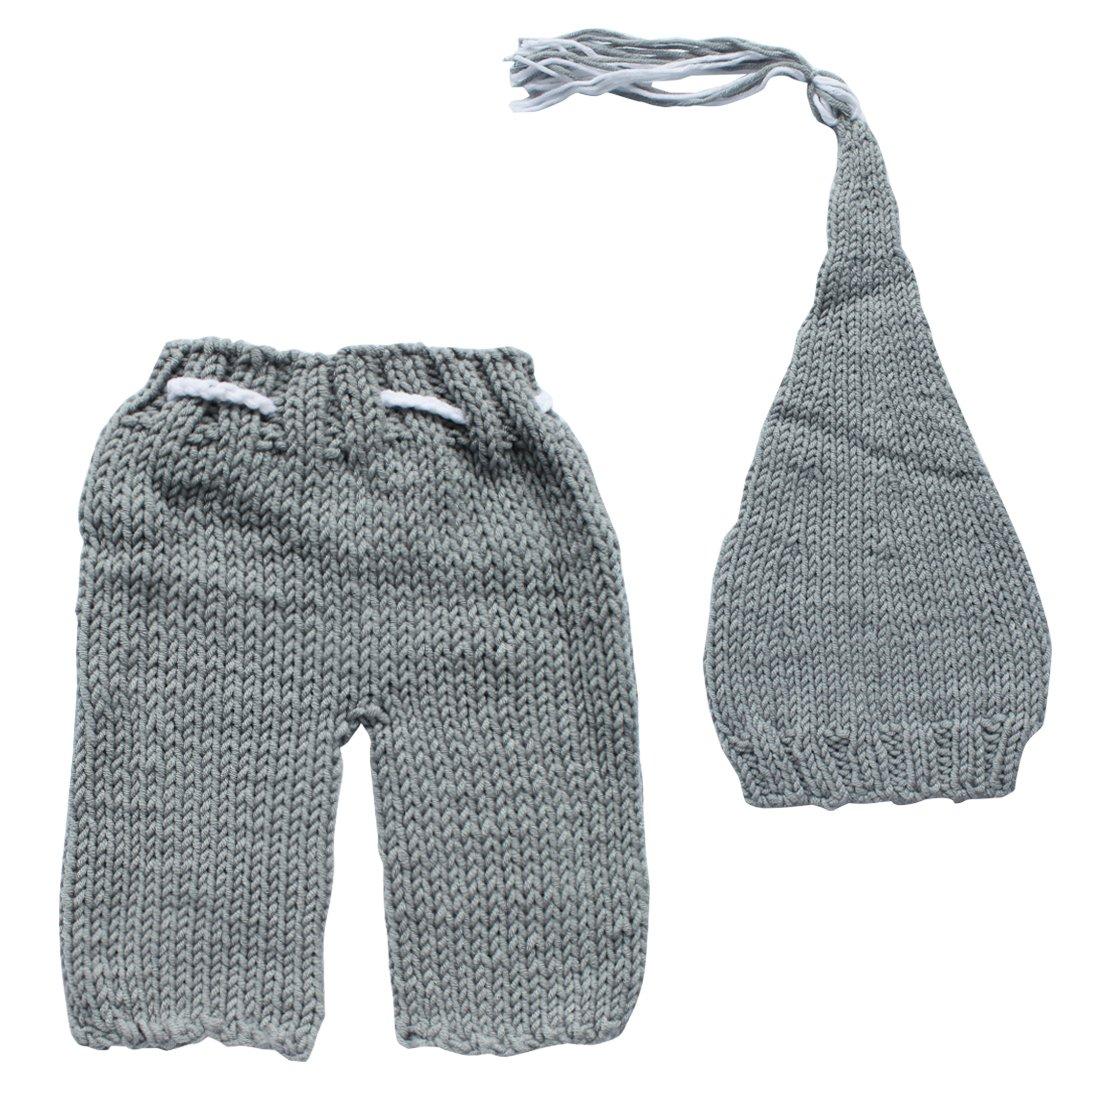 Yizyif Gentleman Jungen Baby Kostüm Fotografie Prop Set Outfits Süss